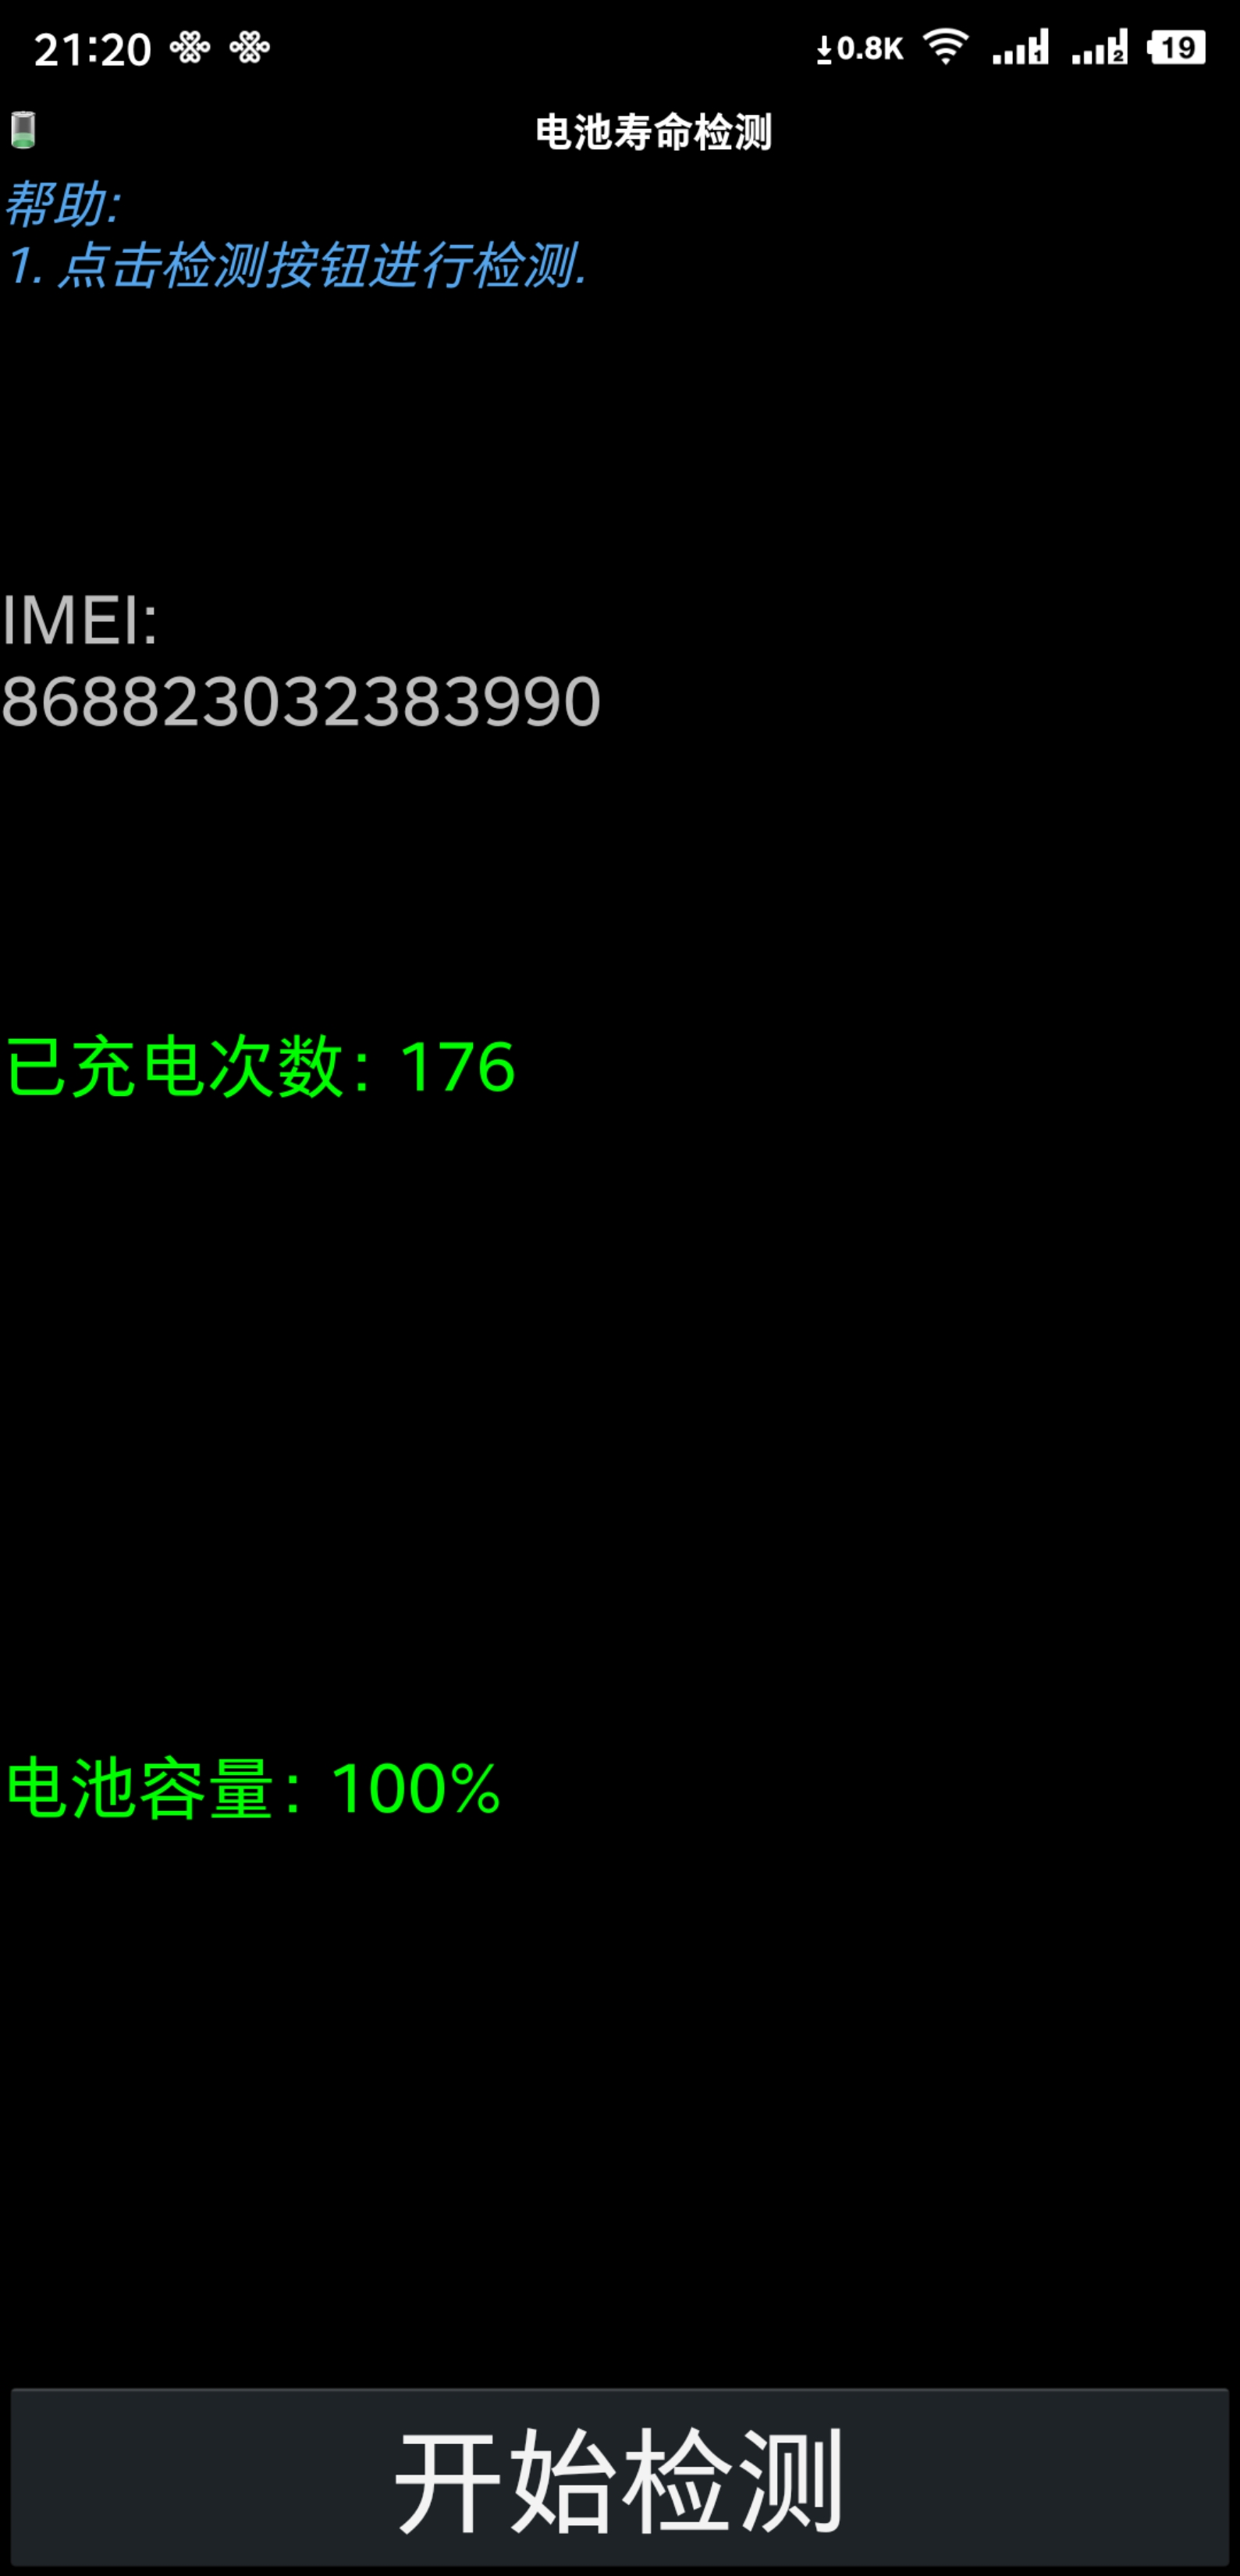 Screenshot_2020-04-25-21-20-08-499_??????.png